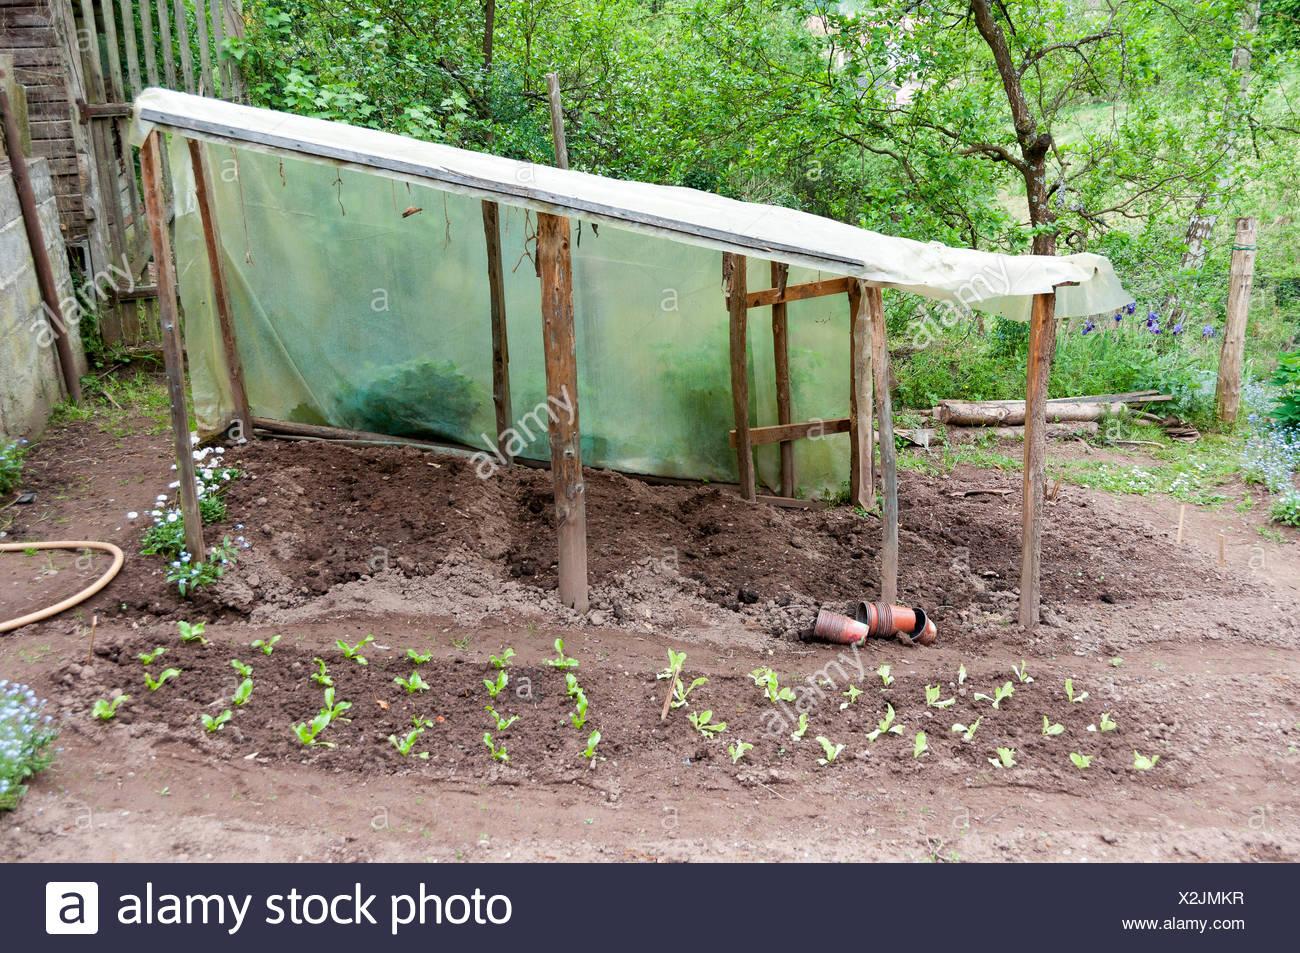 Home Made Garden Greenhouse Stock Photo Alamy